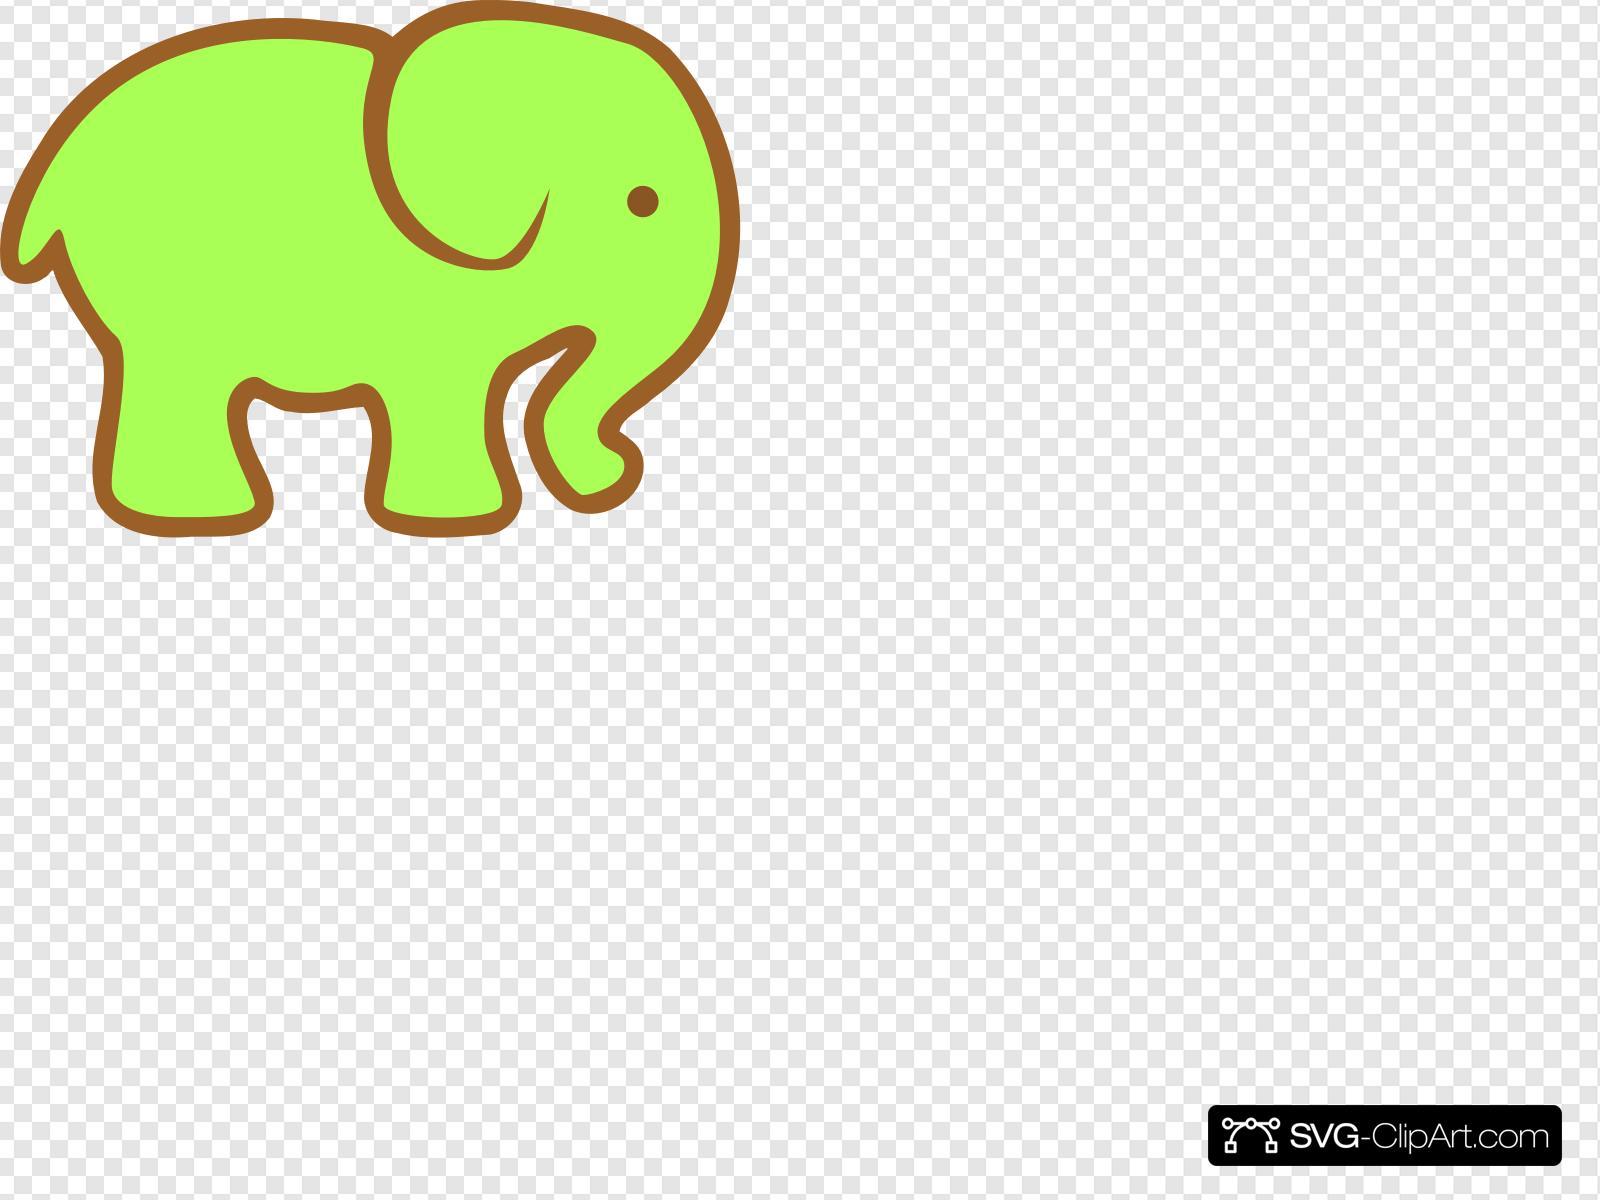 Ellie clipart image royalty free Green Ellie Clip art, Icon and SVG - SVG Clipart image royalty free